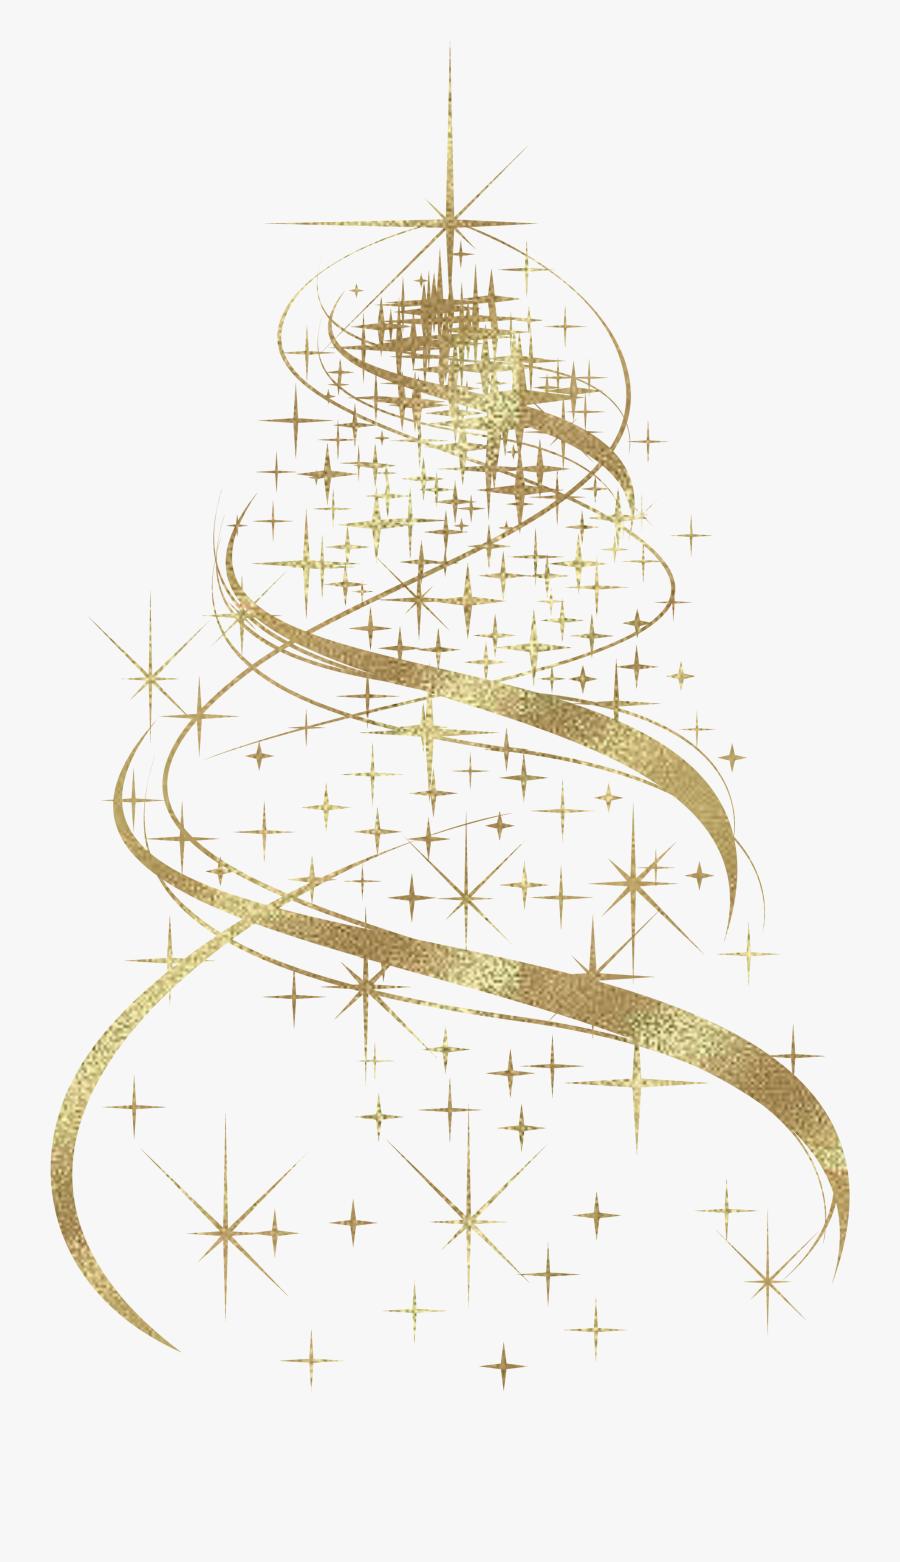 Transparent Golden Christmas Tree Decoration Png Clipart - Christmas Tree Decorations Png, Transparent Clipart